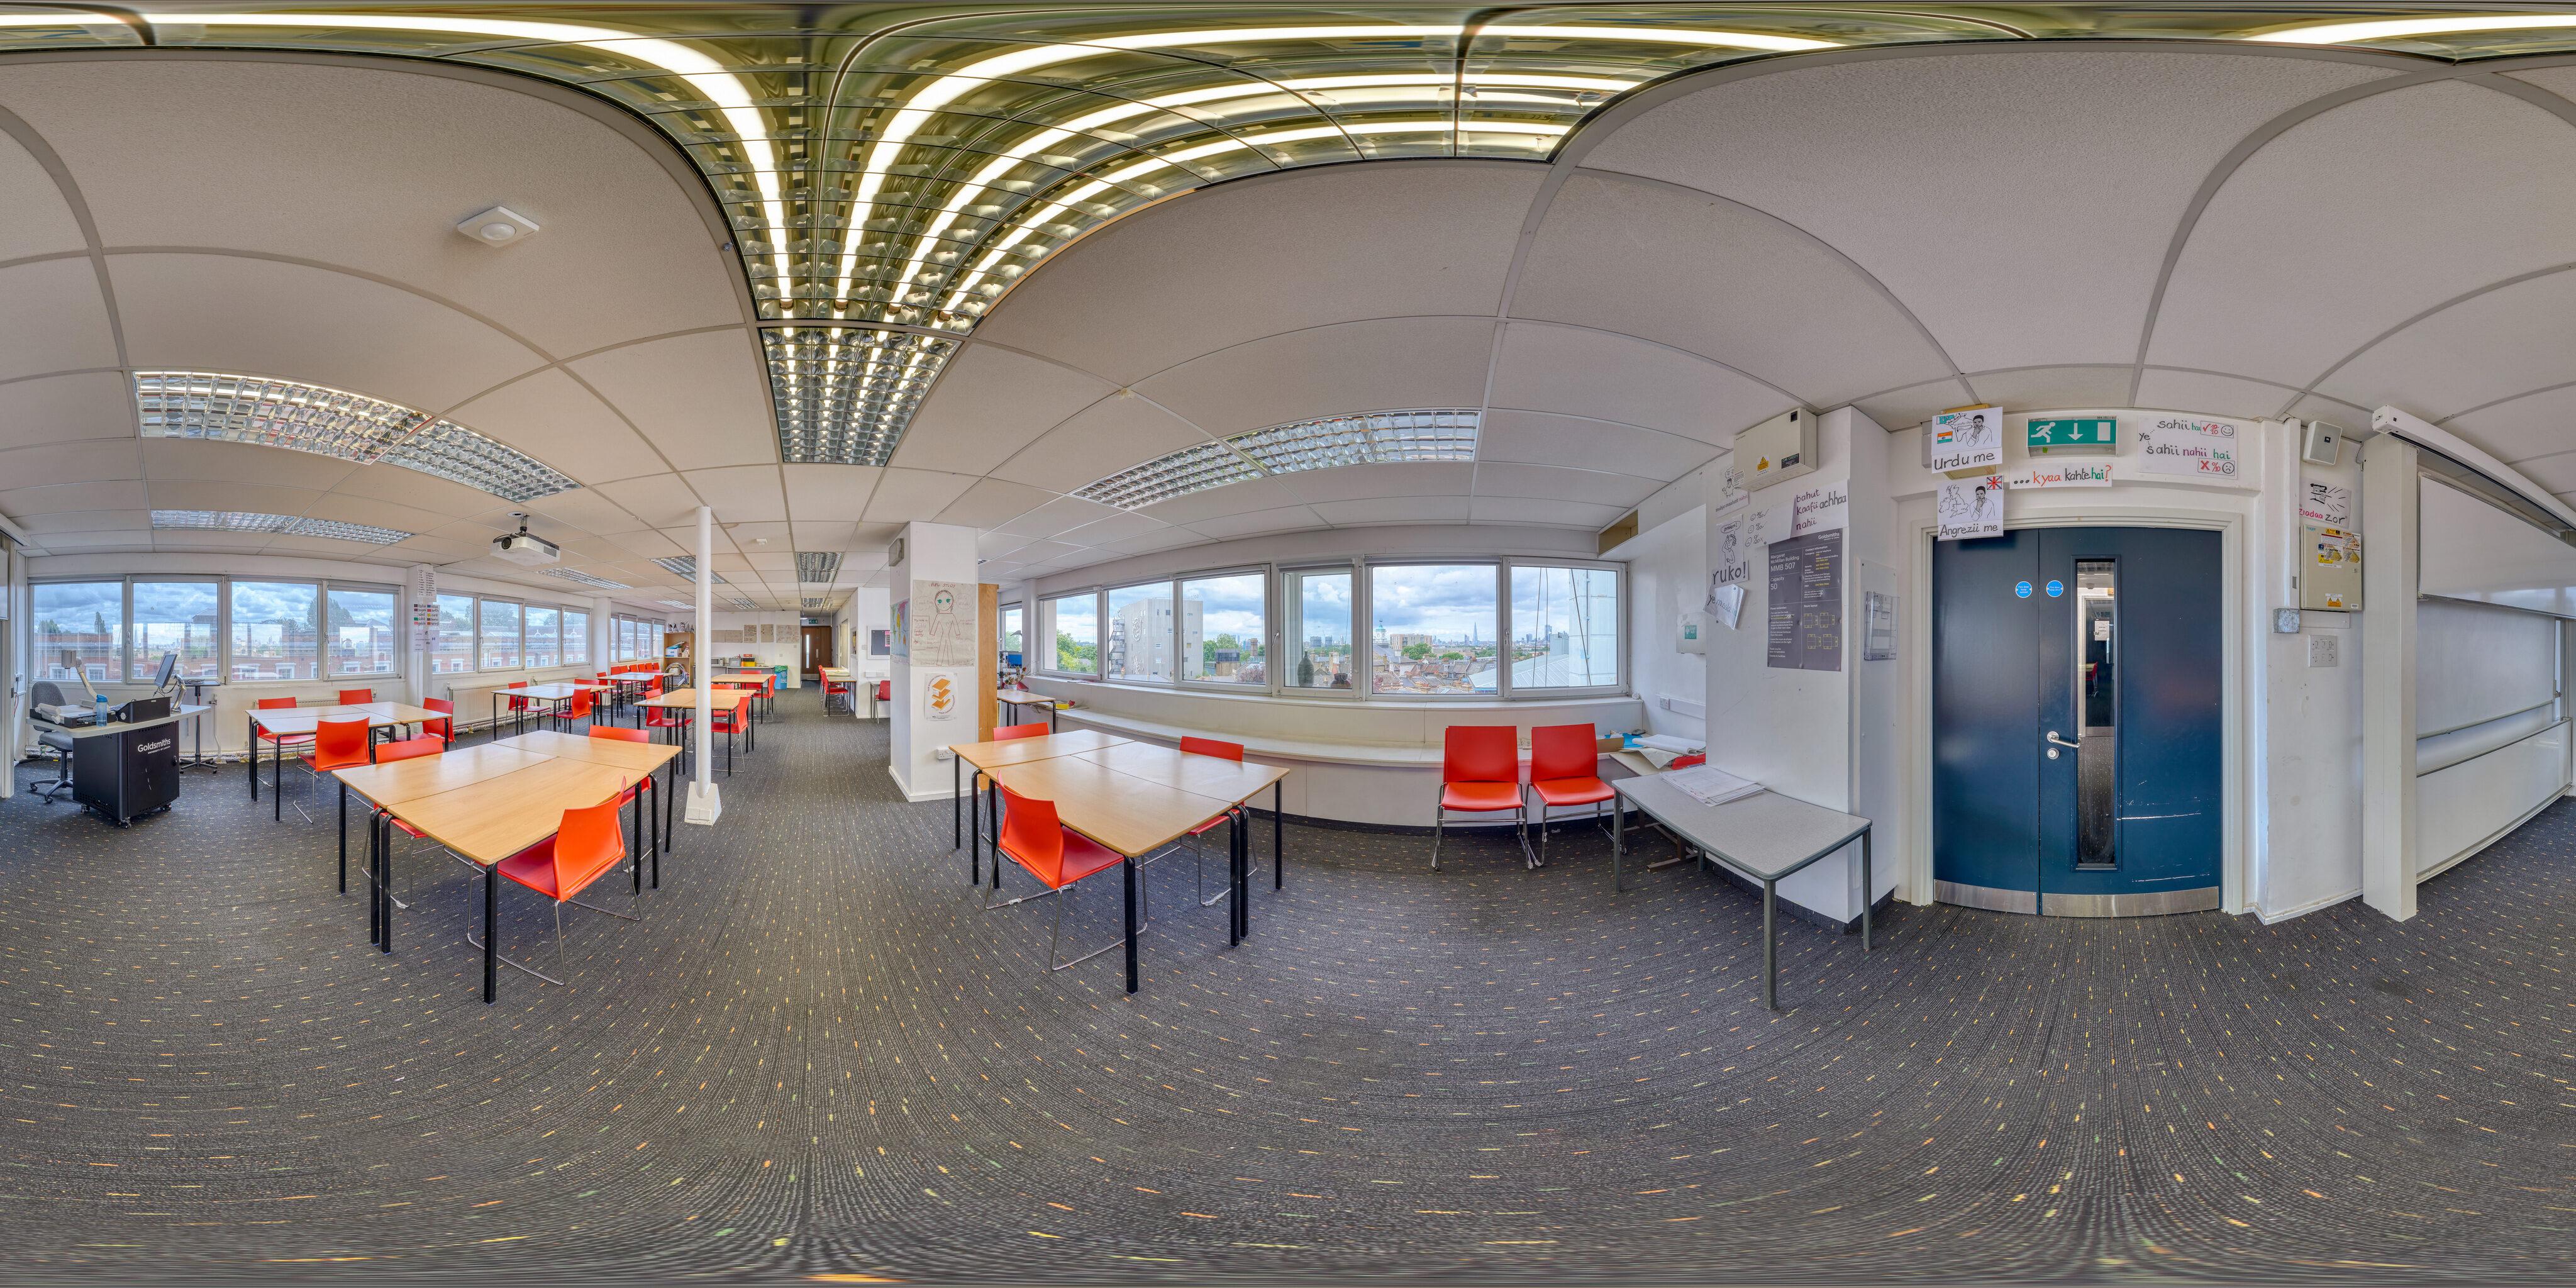 360 of Teaching Space